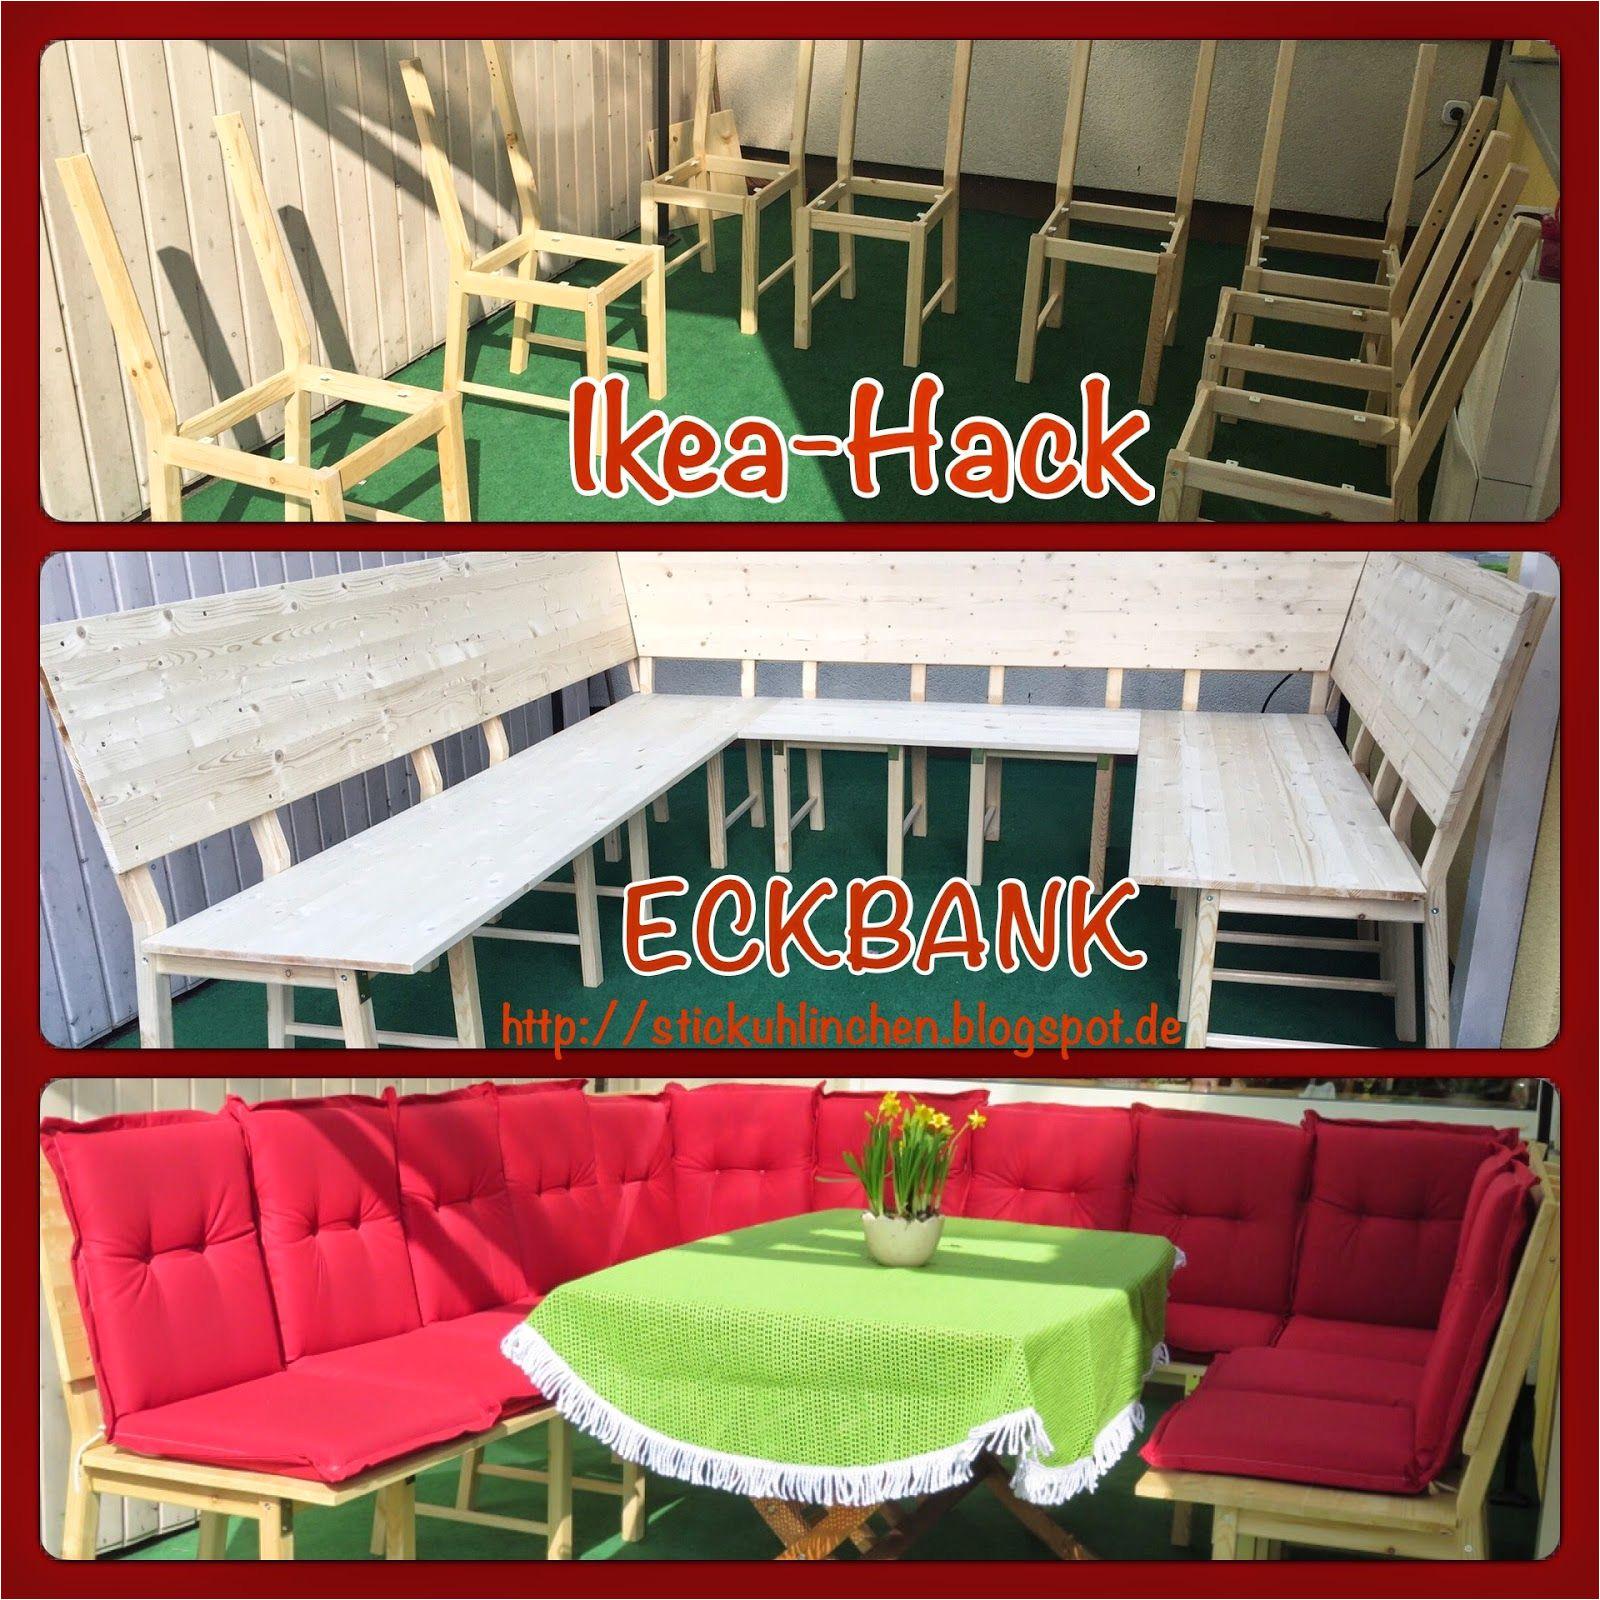 diy ikea hack aus 8 stuhlen wird eine groa e eckbank bzw lounge stickuhlinchen ivar stuhl ikea chair